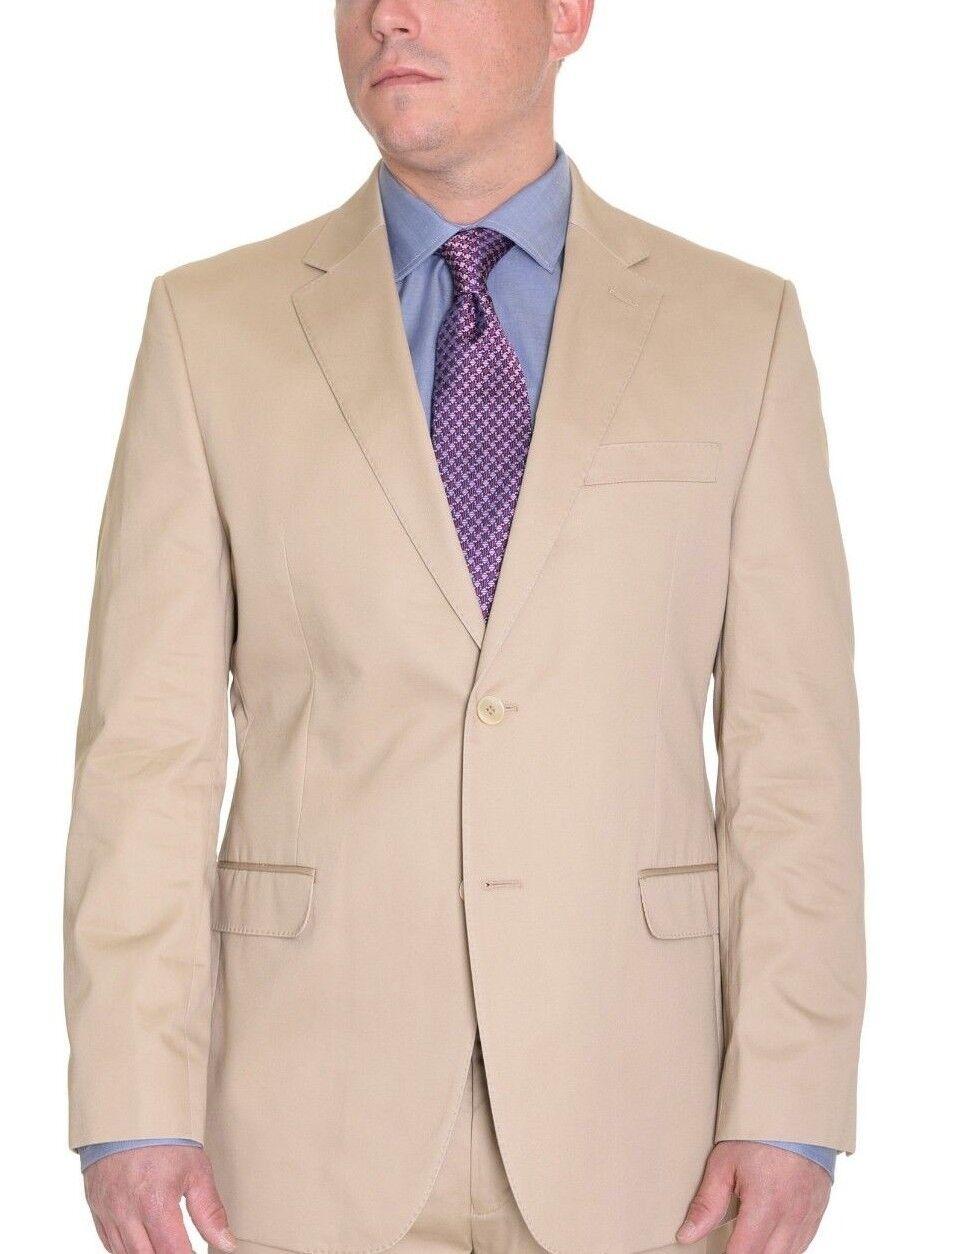 Ralph Lauren Tan Light Braun Slim Cotton Summer Two Button Blazer Sportcoat 44S